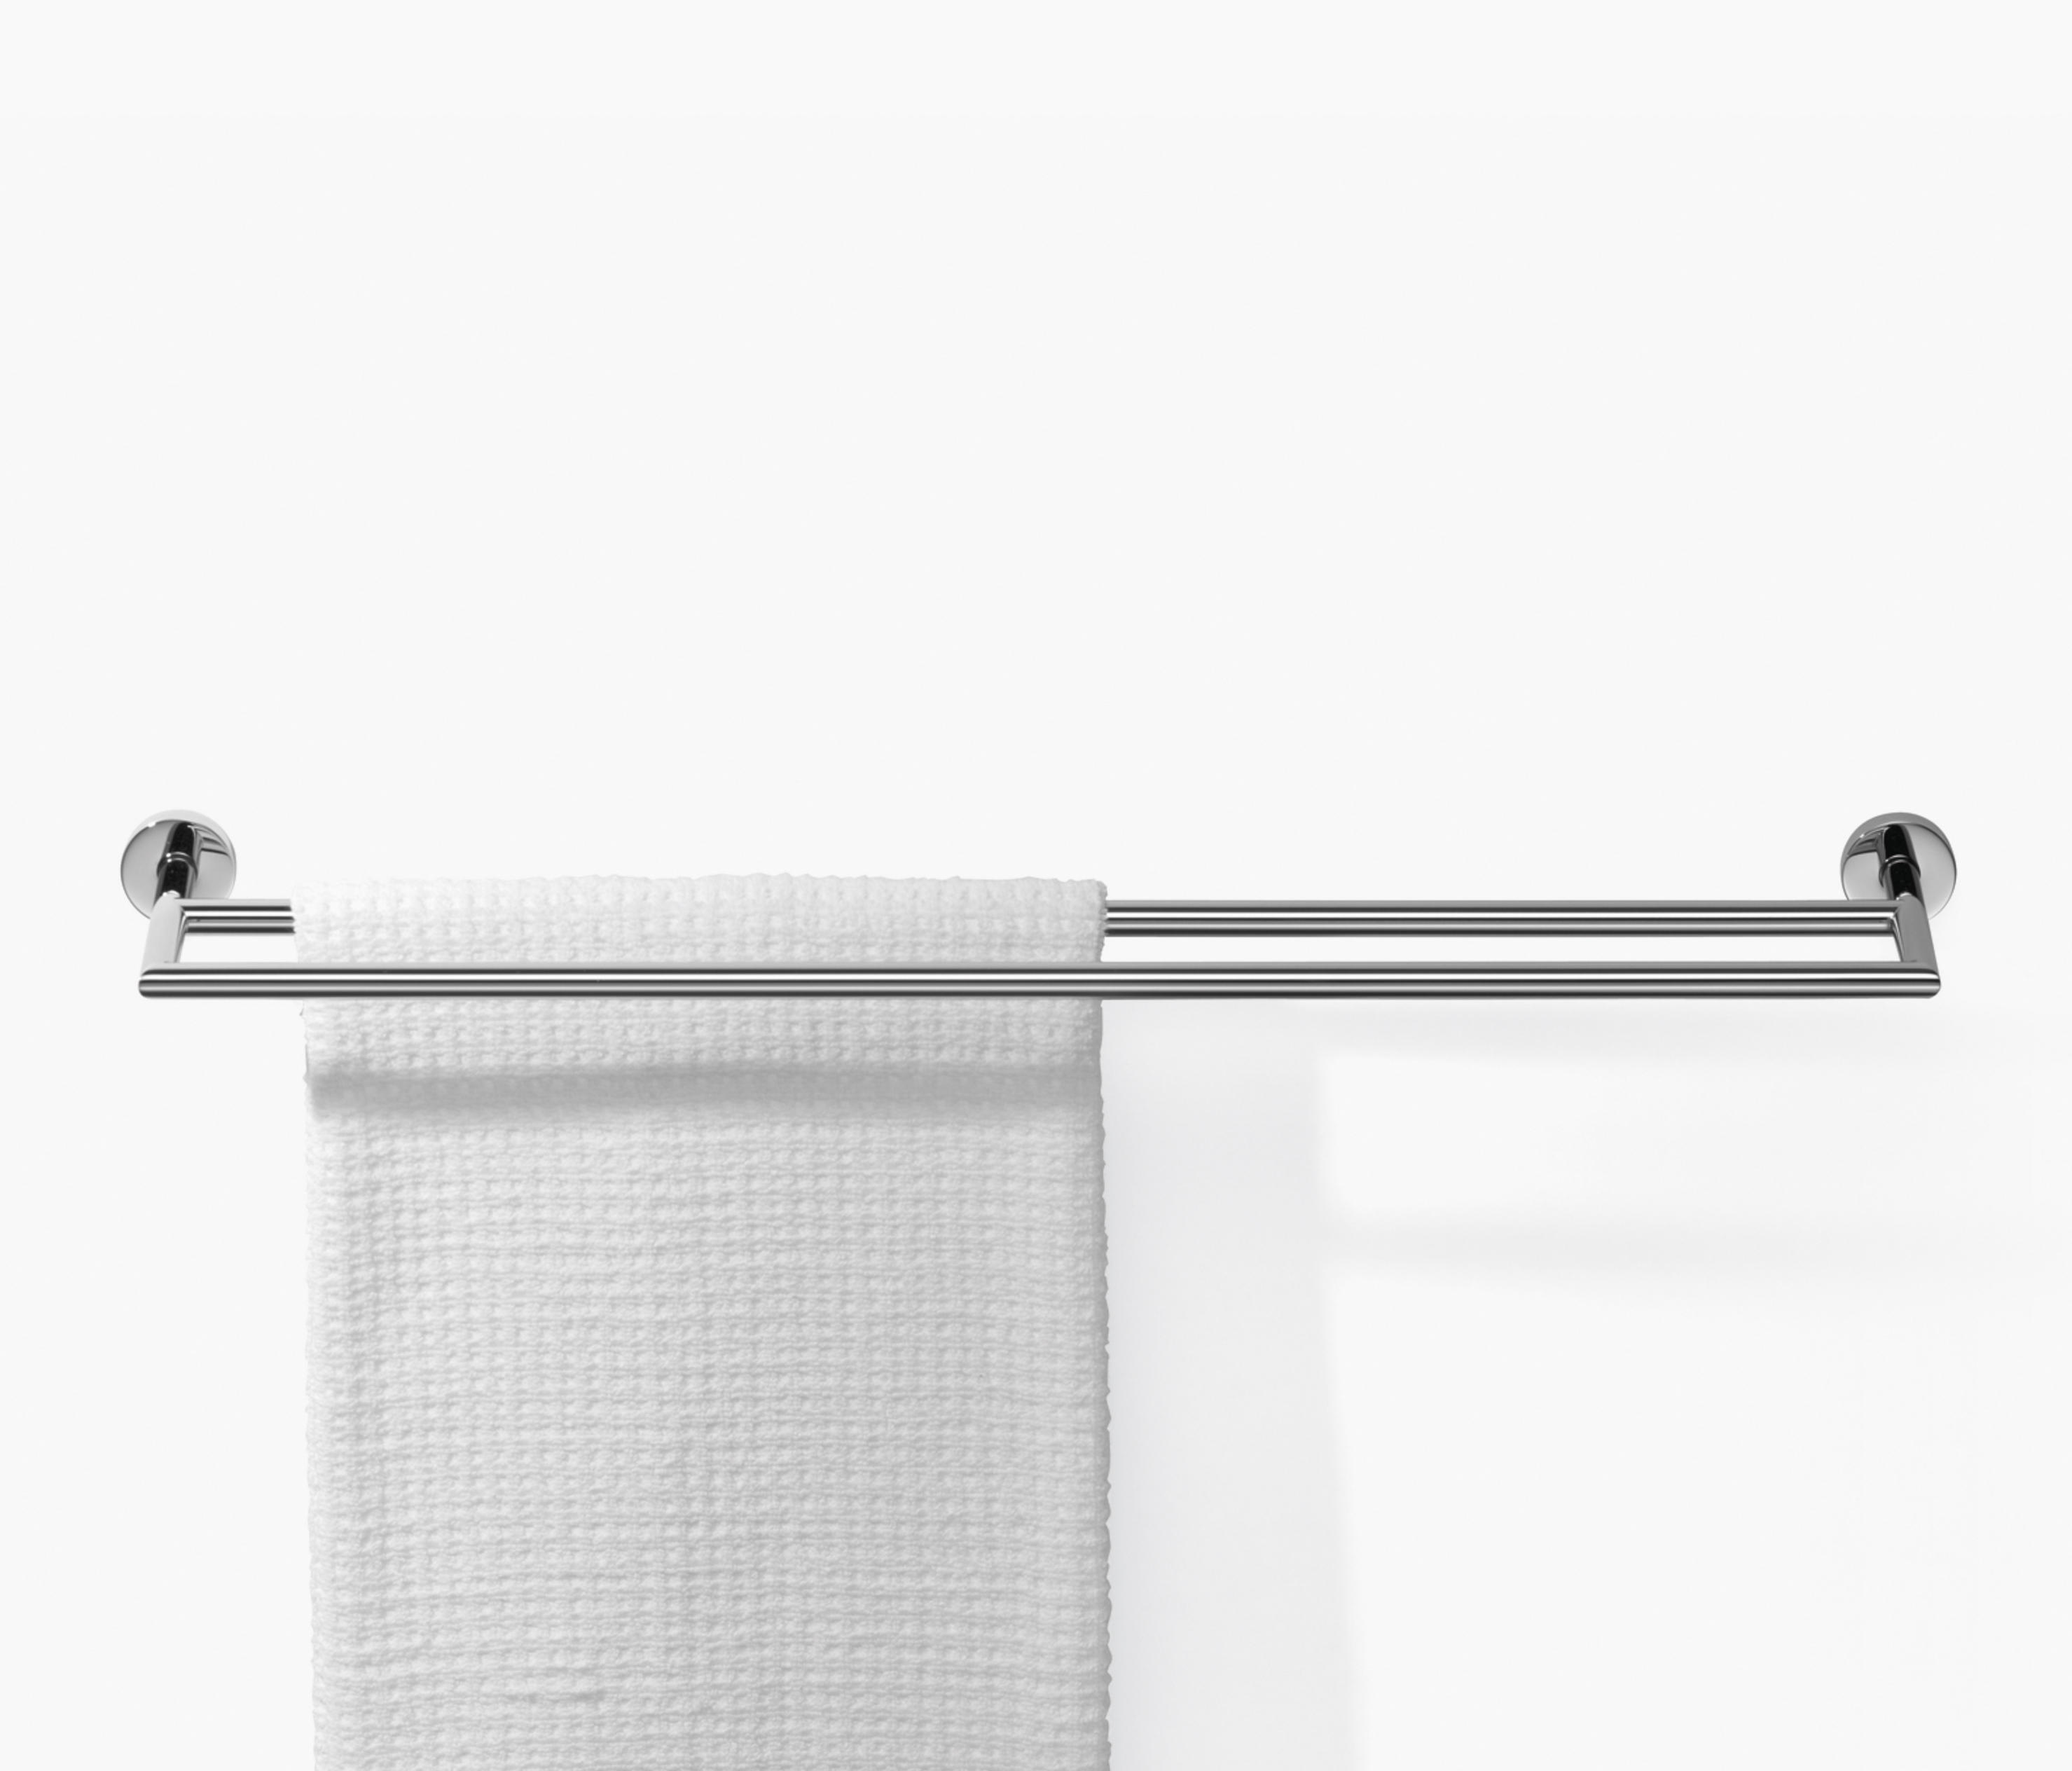 badetuchhalter 2 teilig handtuchhalter von. Black Bedroom Furniture Sets. Home Design Ideas